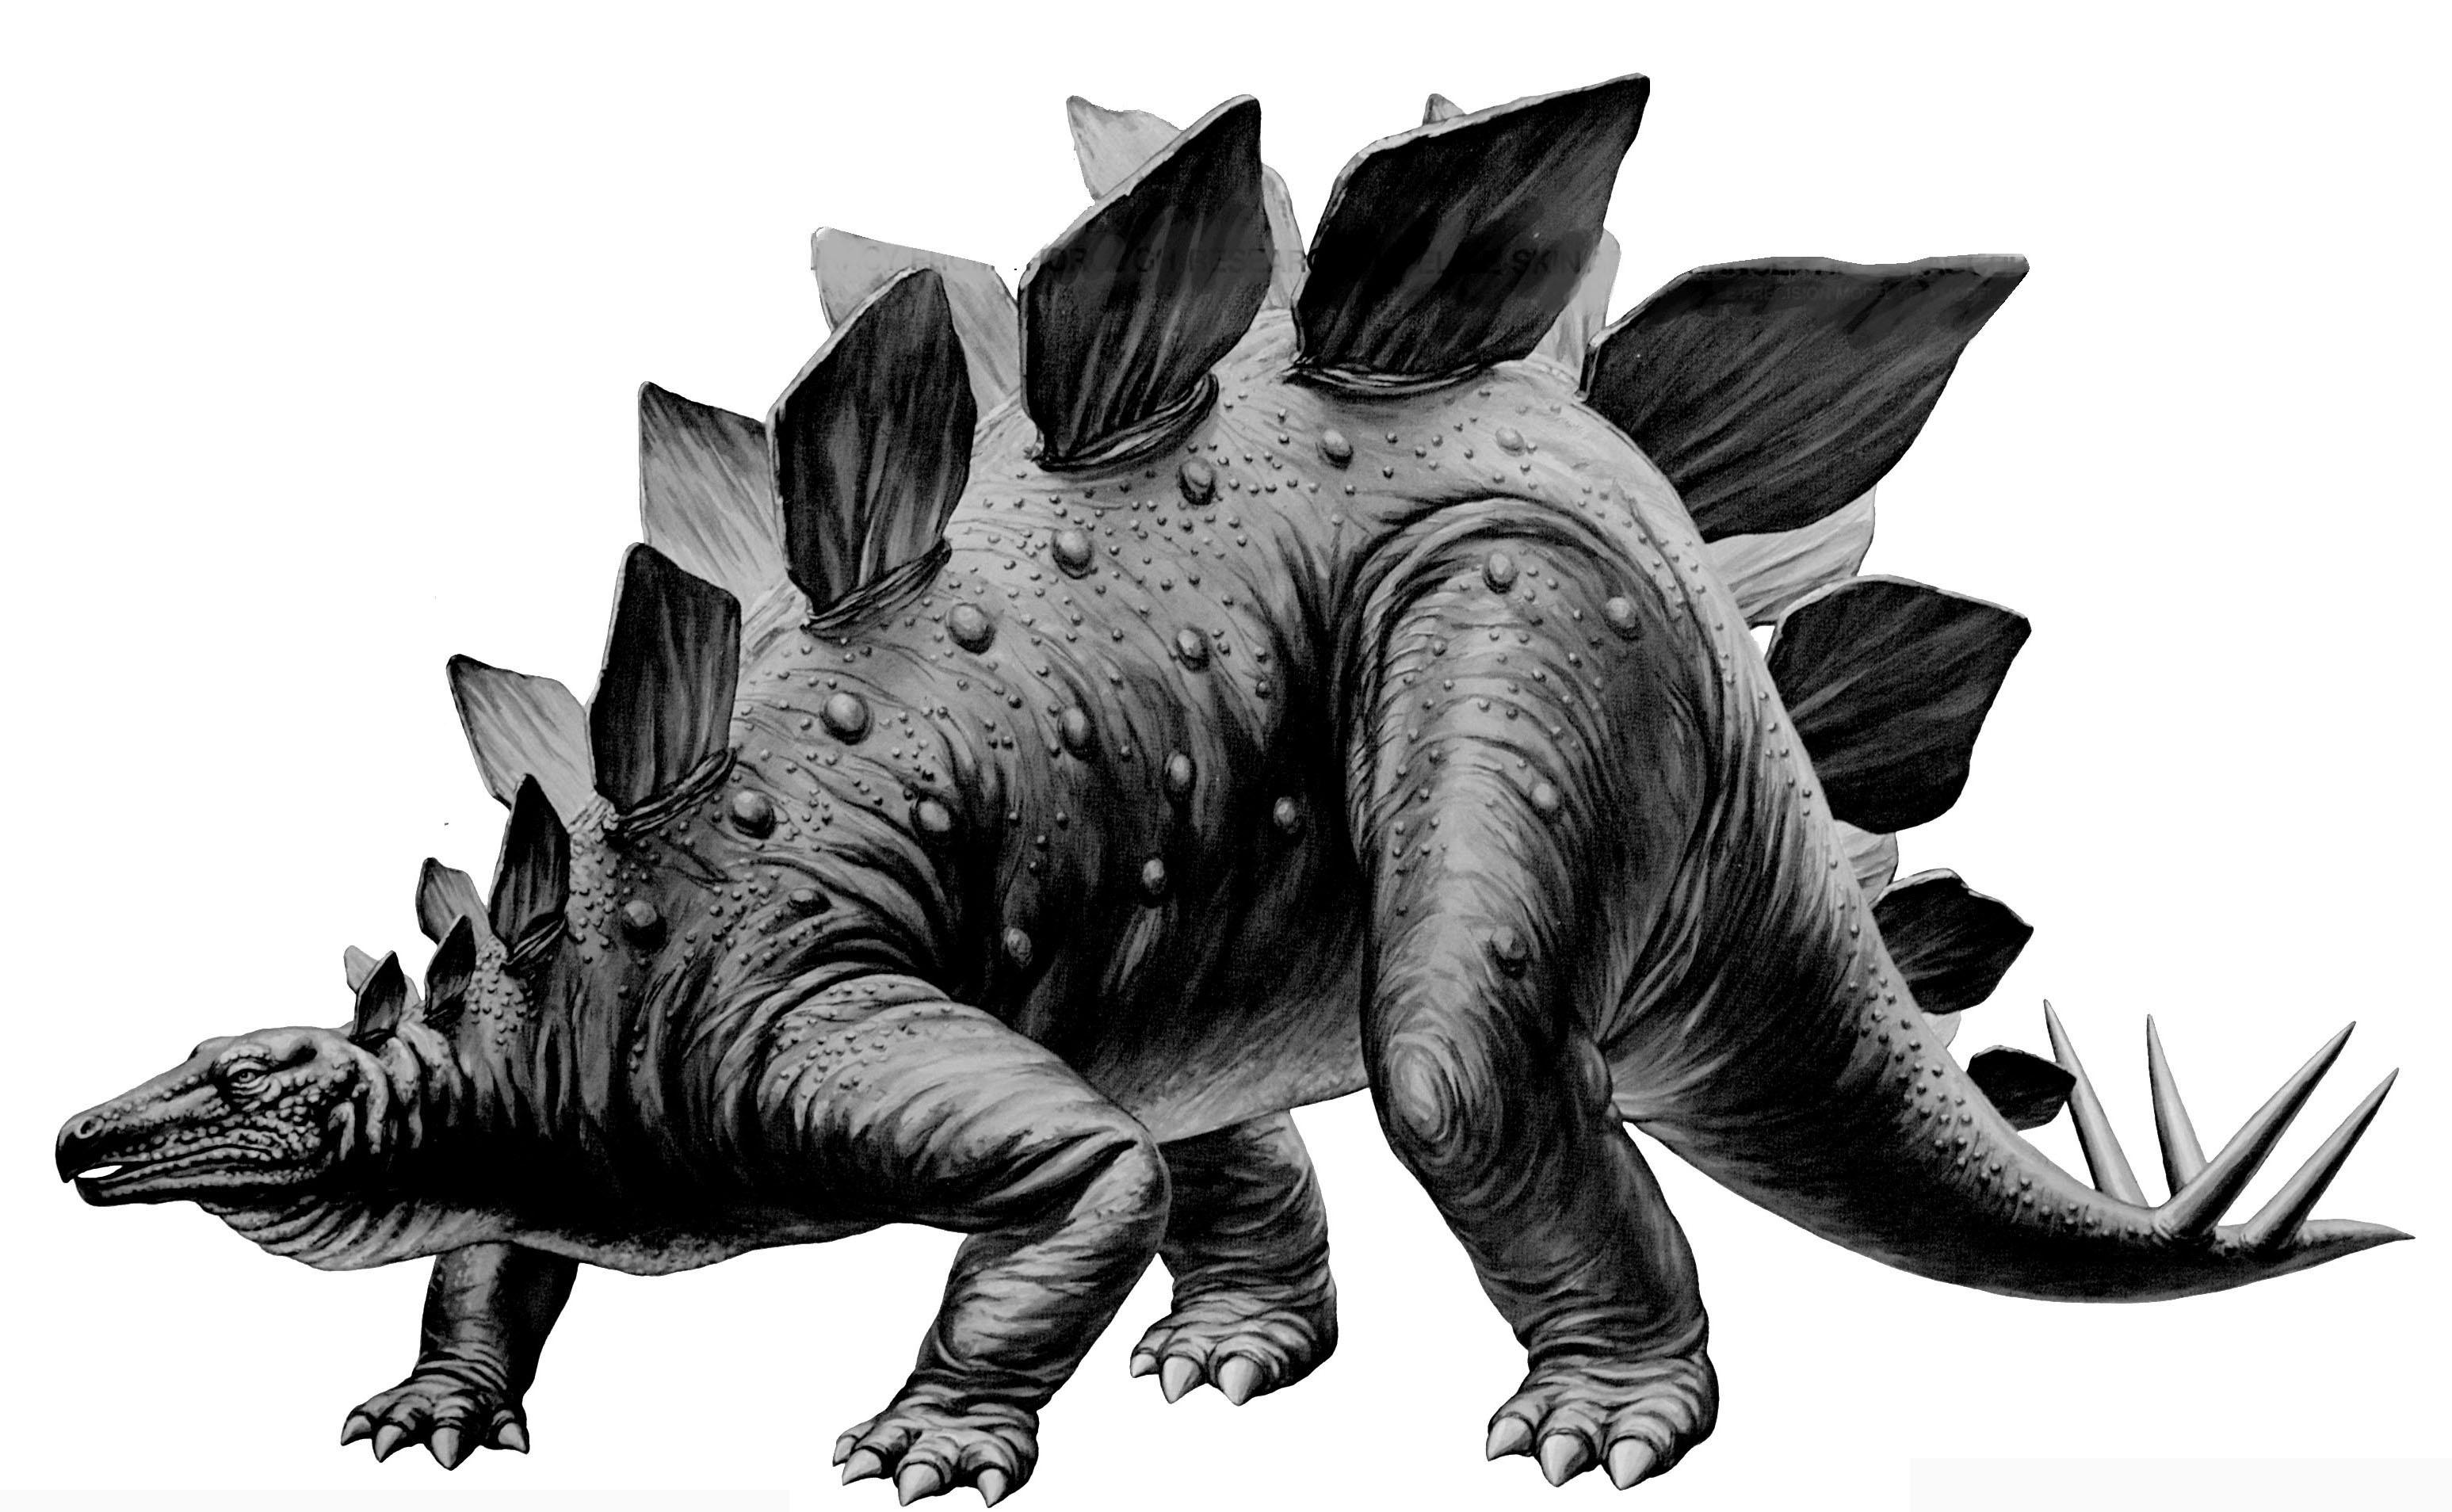 pictures of a stegosaurus nofineline stegosaurus stenops tamiya 135 of a stegosaurus pictures